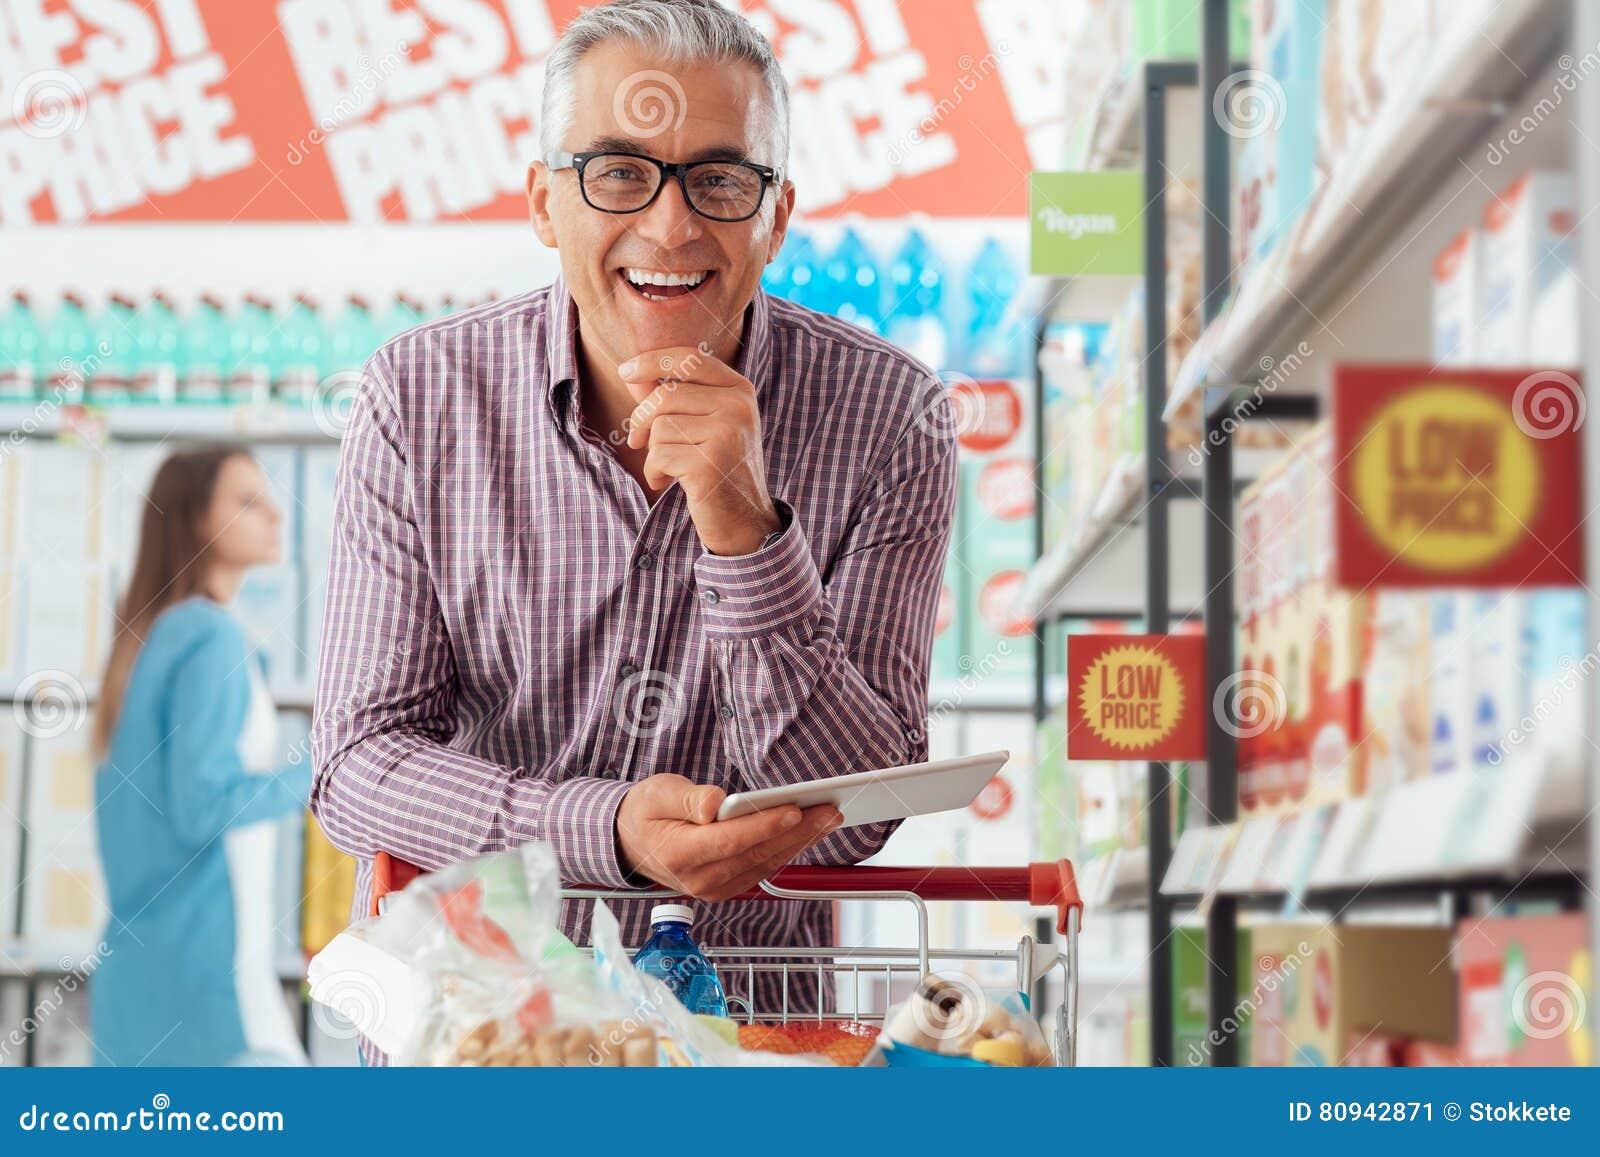 Man shopping at the store